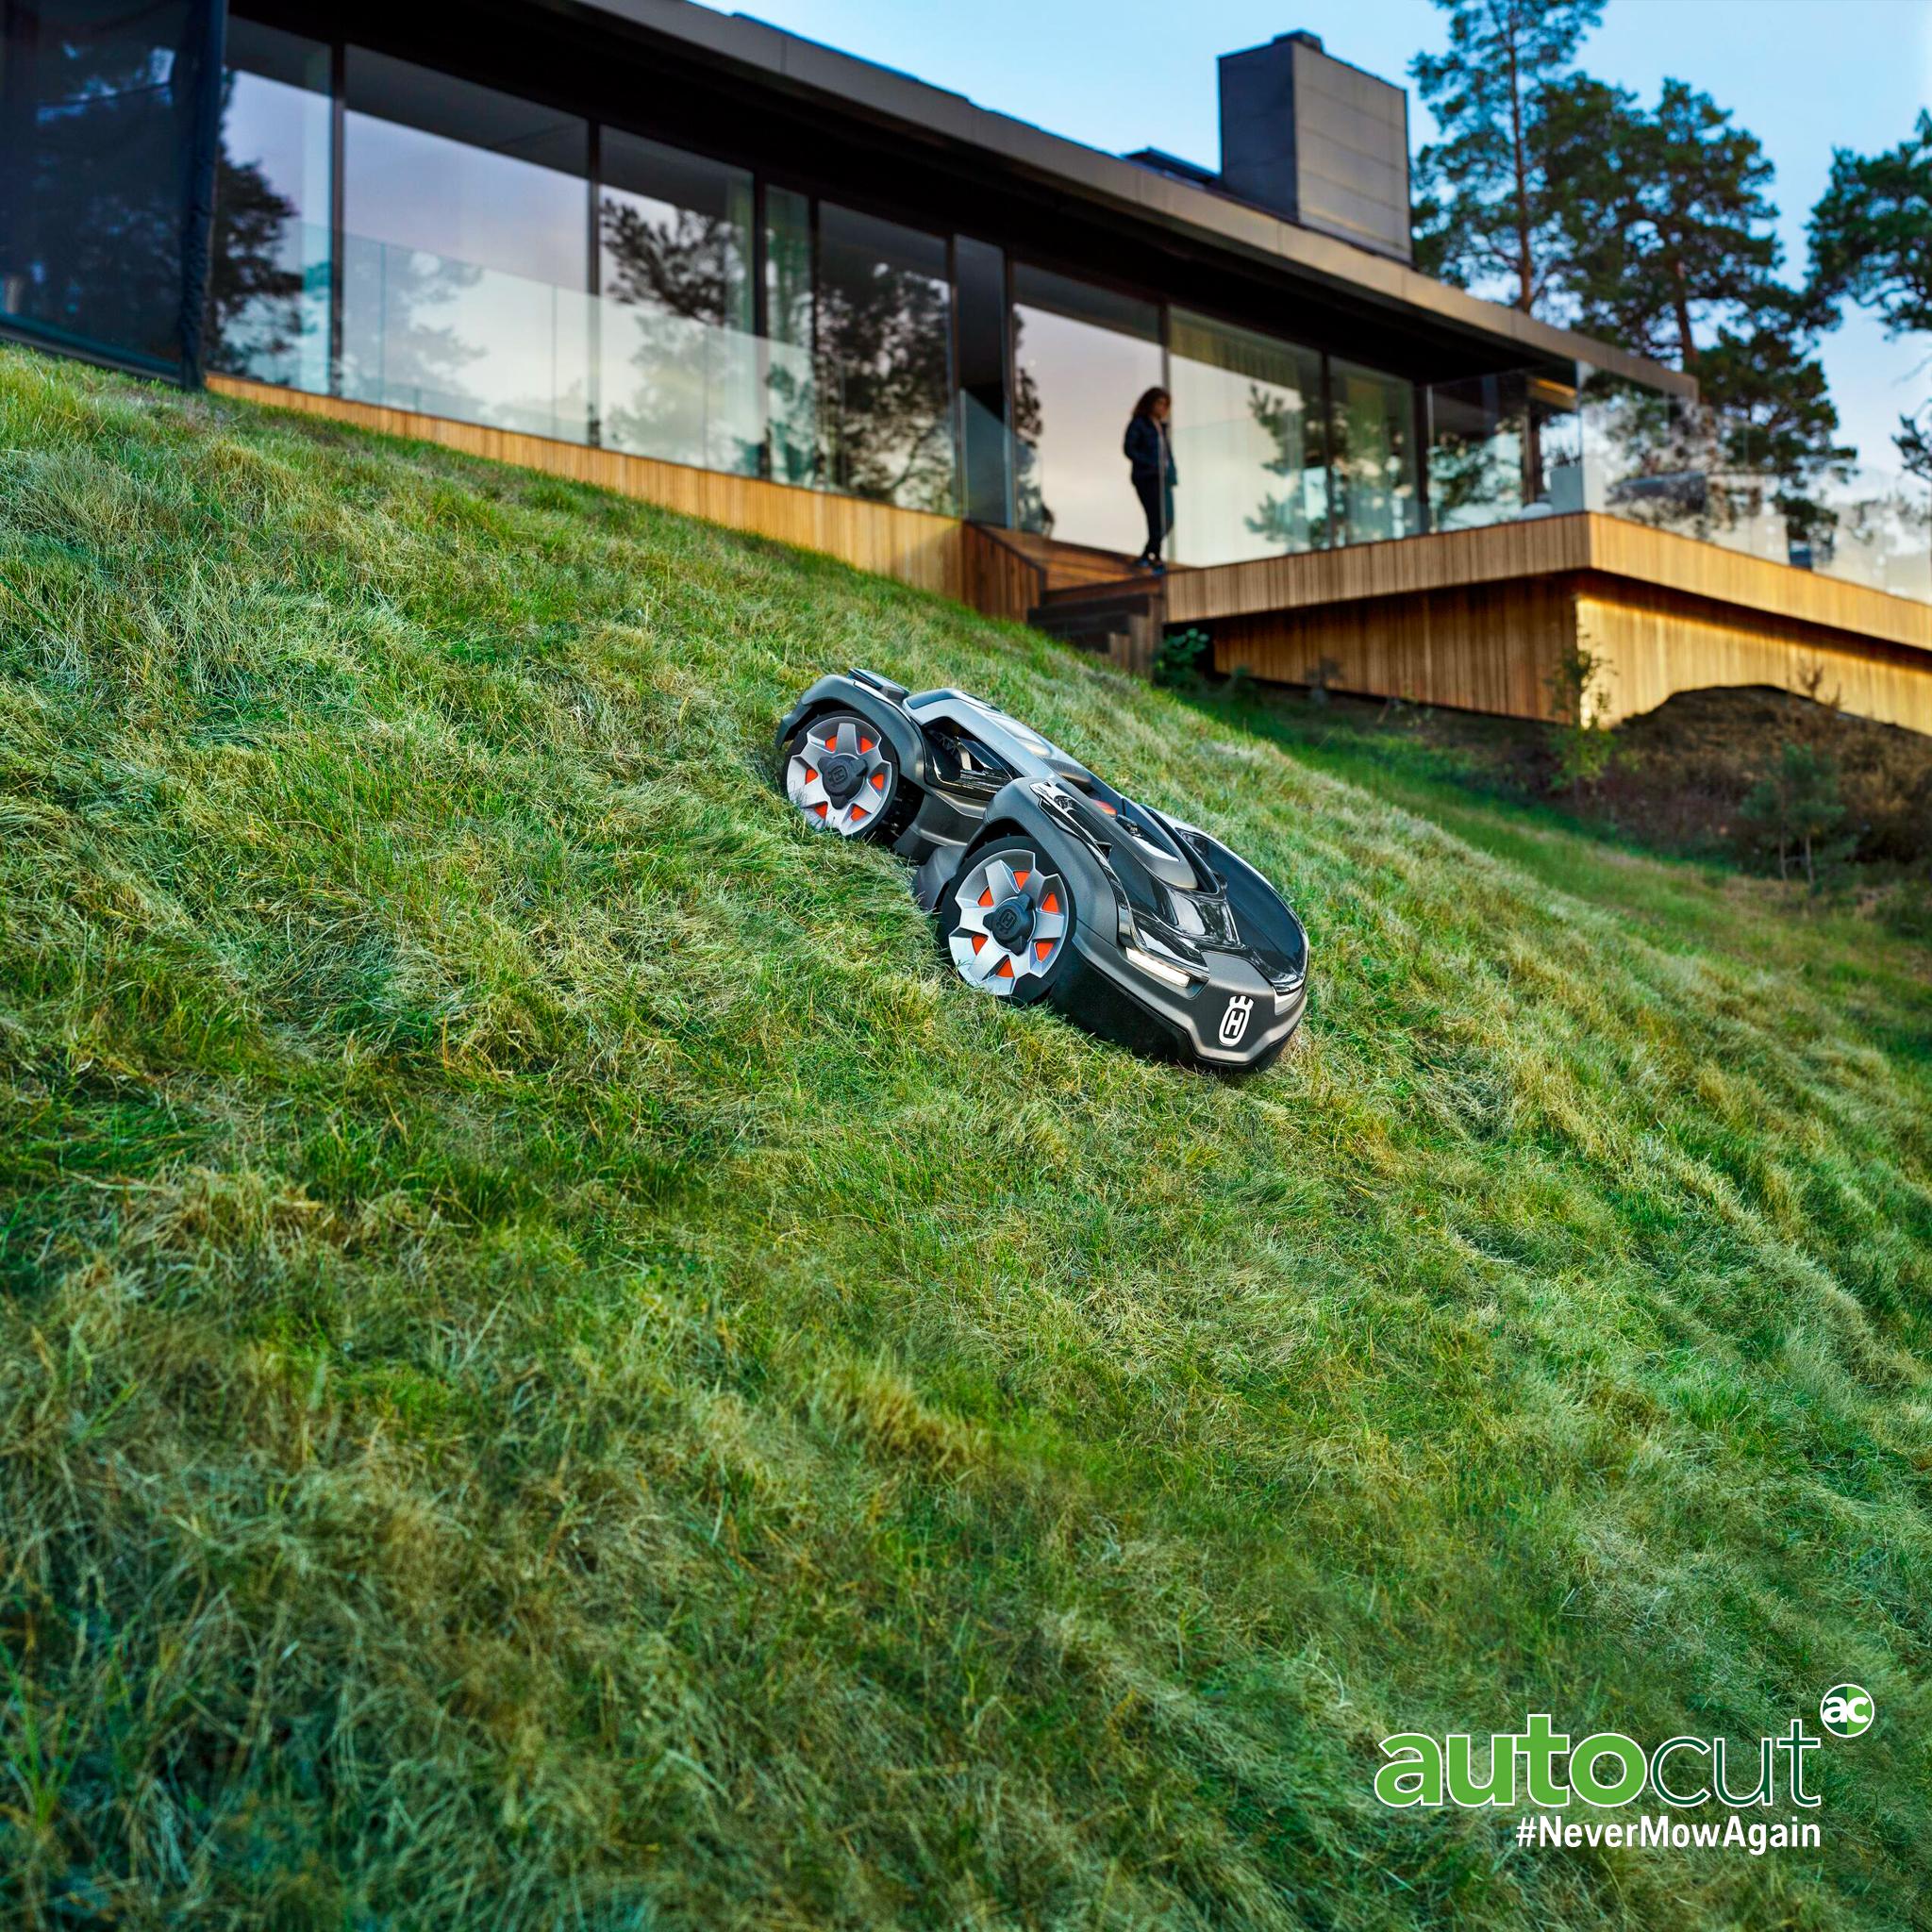 Meet The Mower: Automower® 435X AWD